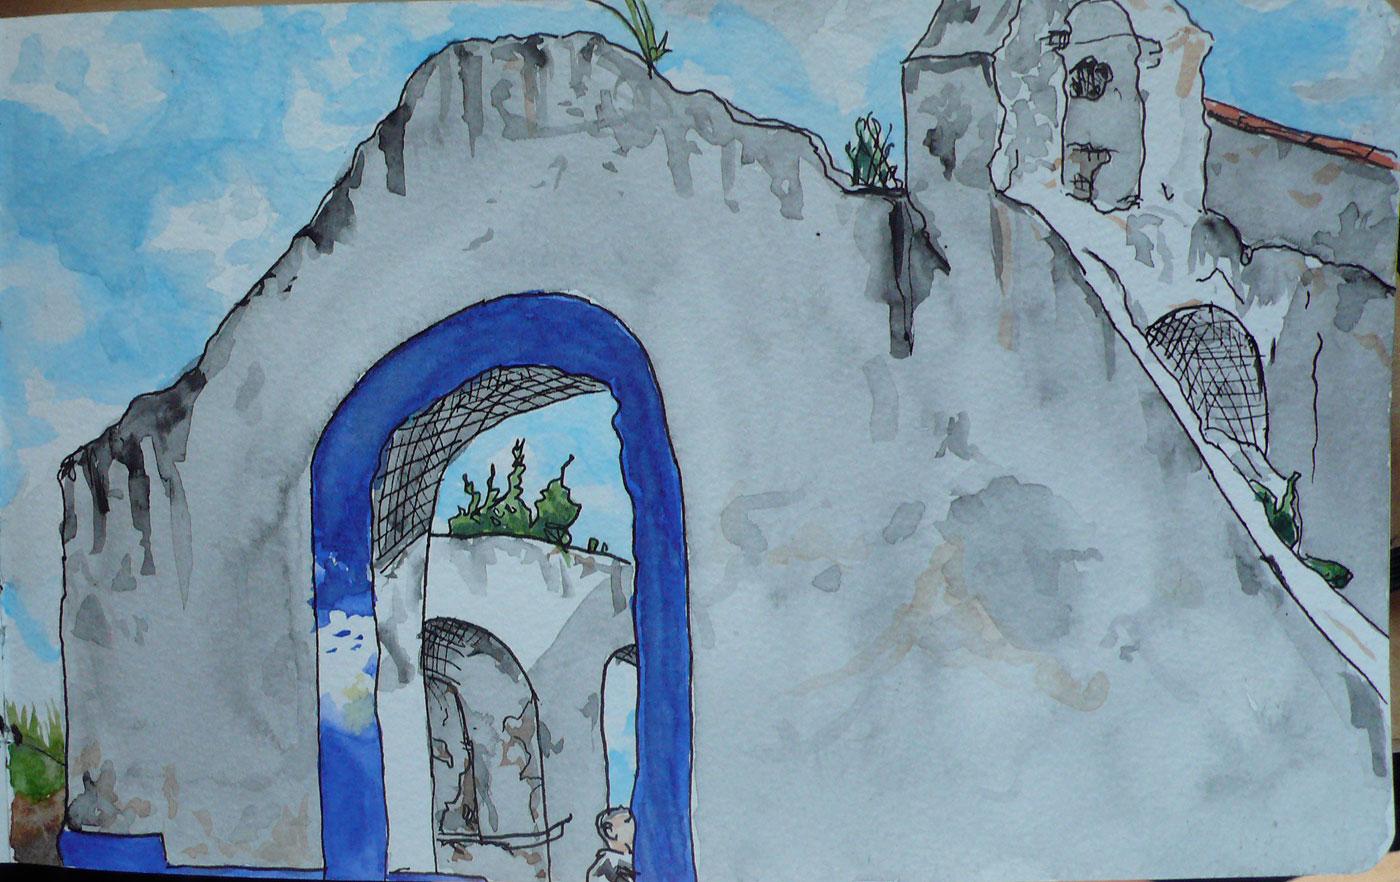 "17. Ruins in Santiago do Caçem, Setúbal. Pen & watercolor, 5"" x 7.9"", 2011"